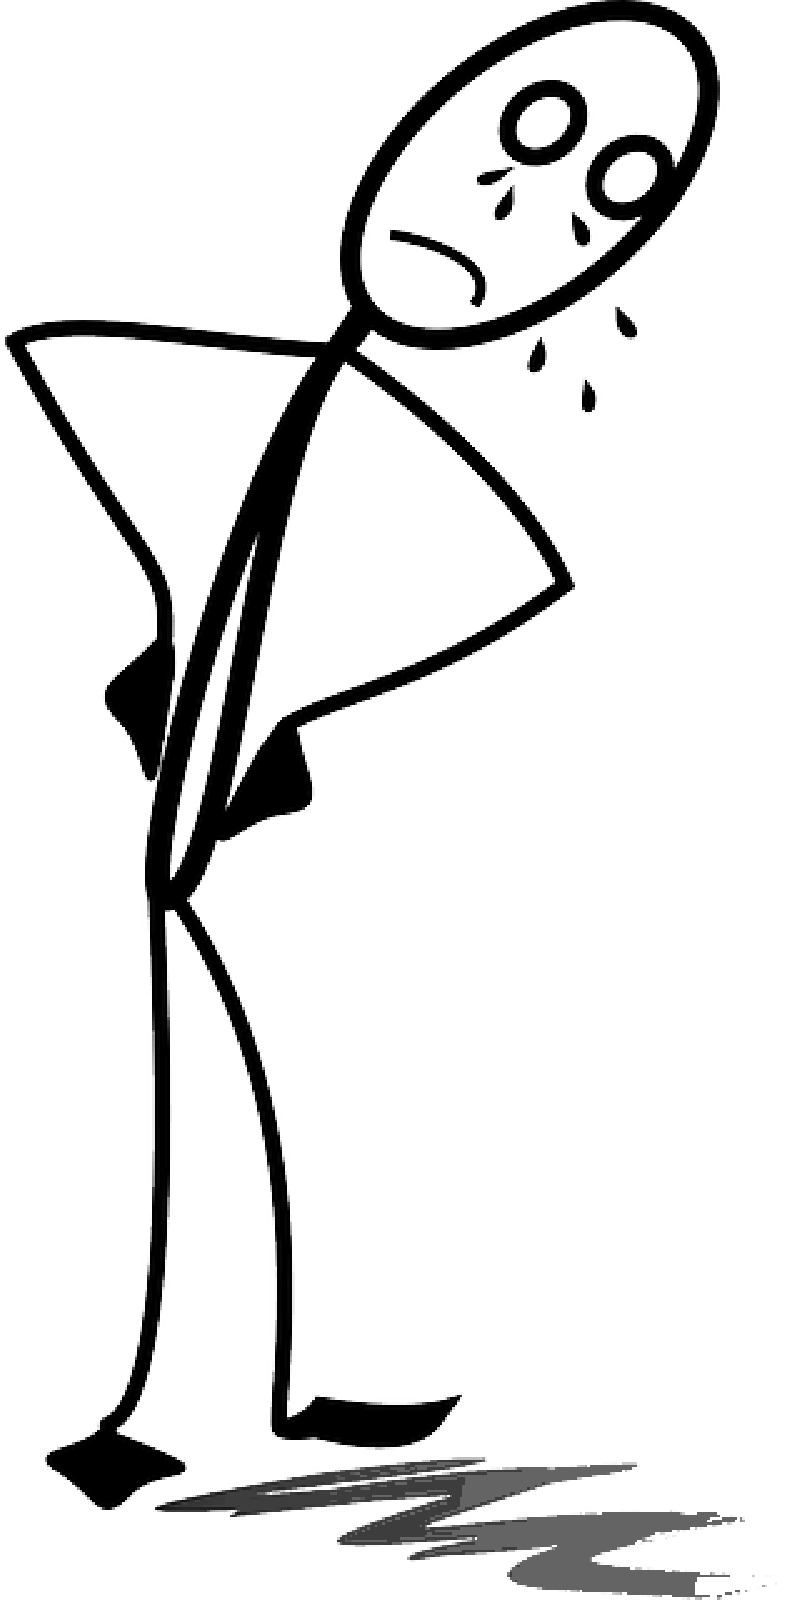 About stickmancrymansadstickfigurematchstickman. Depression clipart black and white